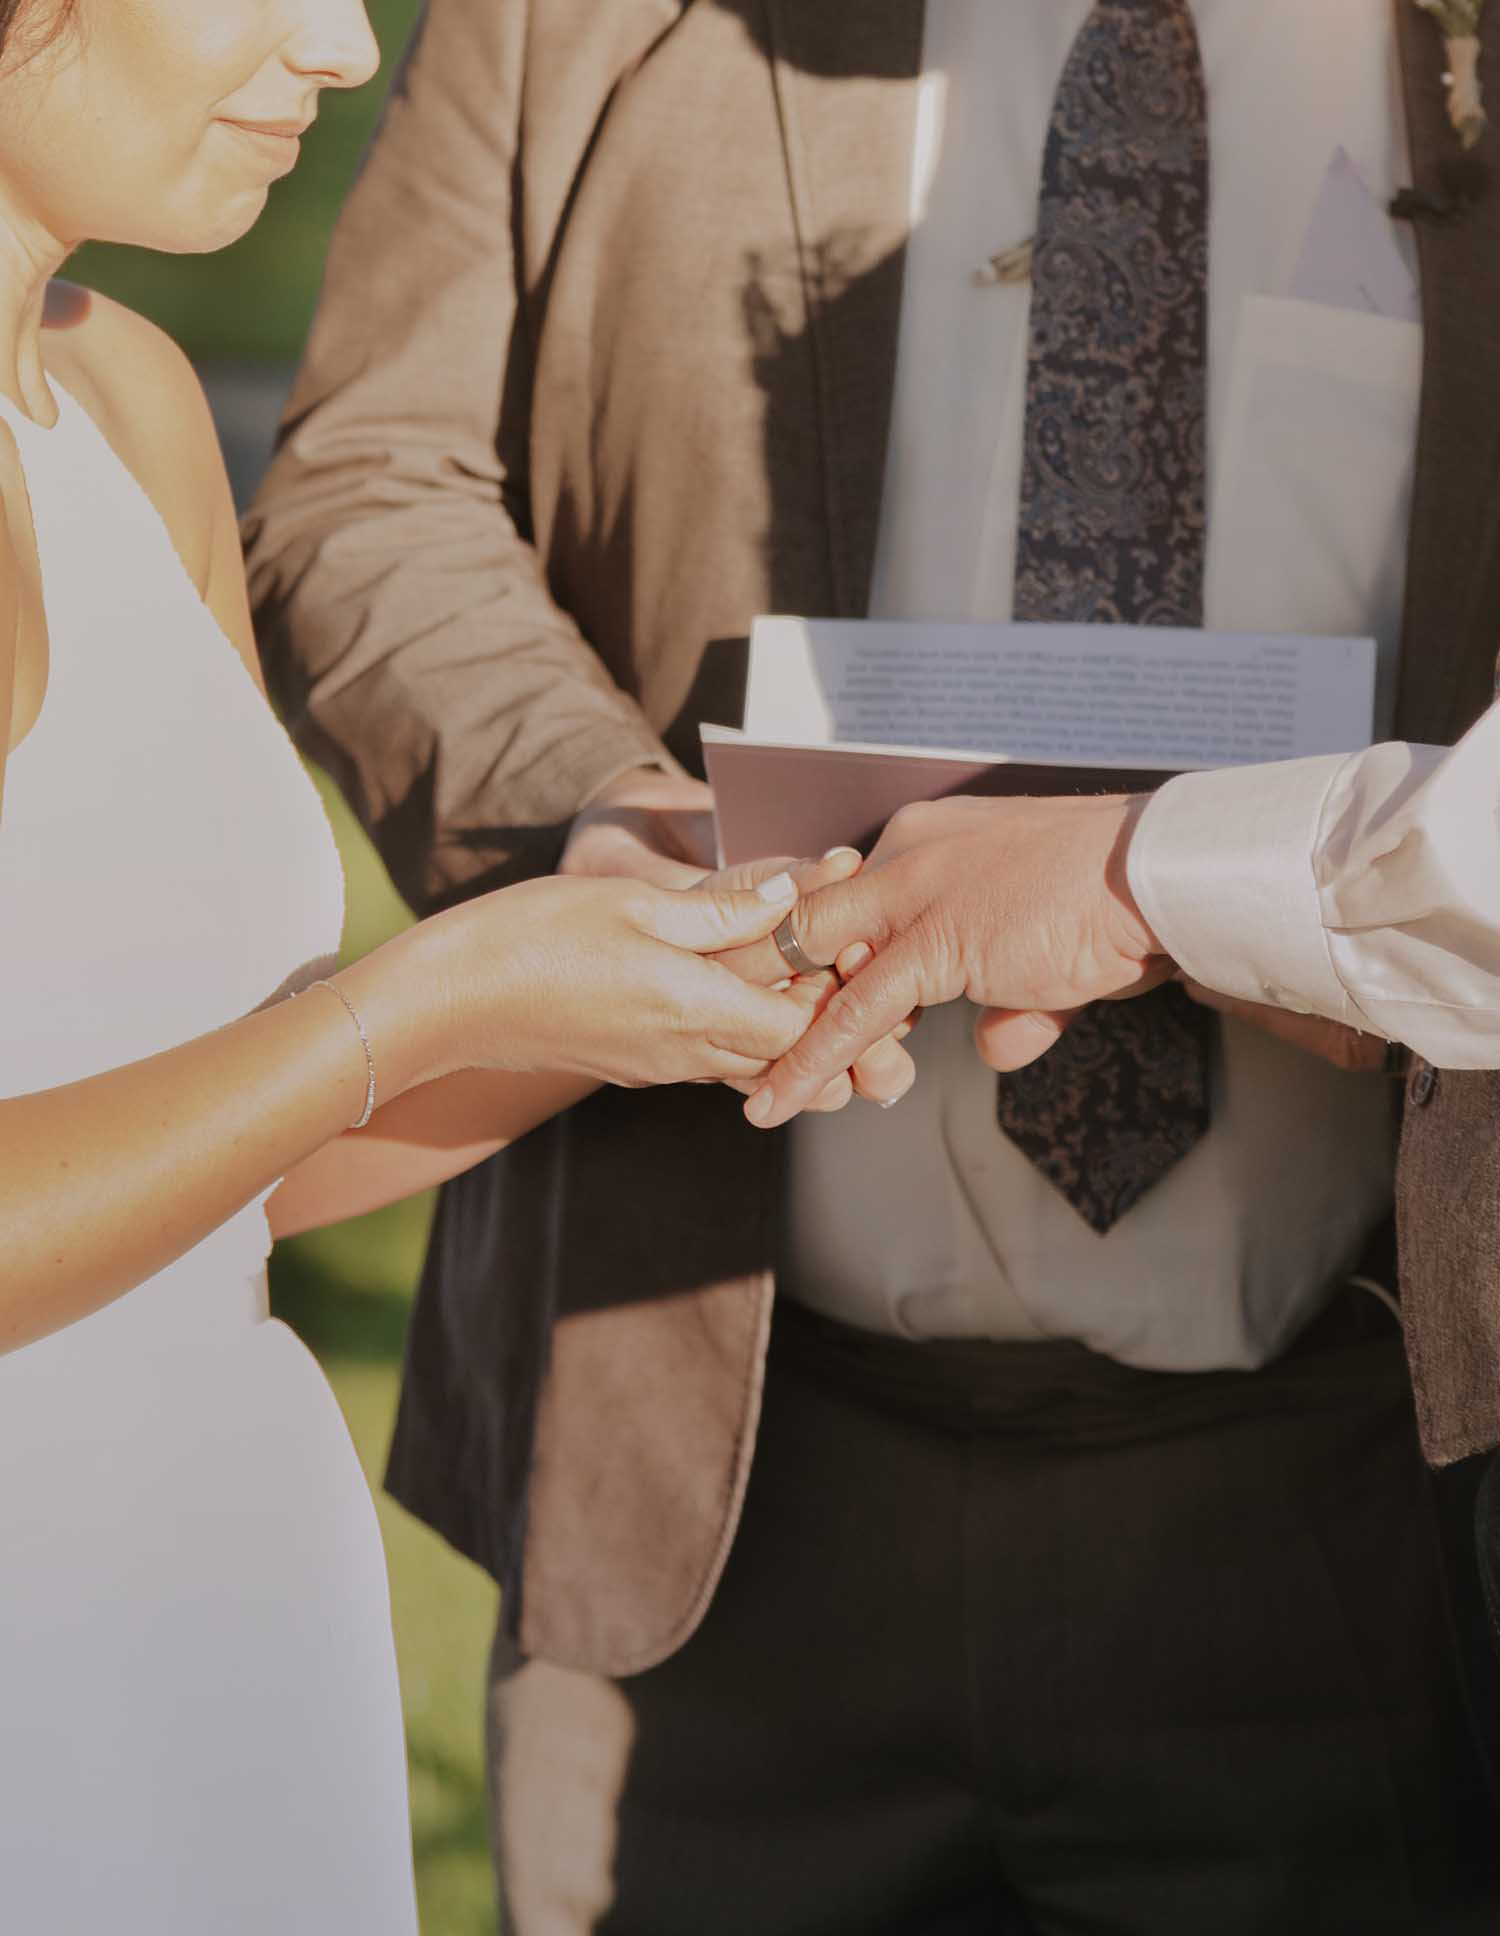 Bonnie-Scott-Rustic-Wedding-Chico-Ca-Butte-Creek-Country-Club2Bonnie-Scott-Rustic-Wedding-Chico-Ca-Butte-Creek-Country-Club4b.jpg